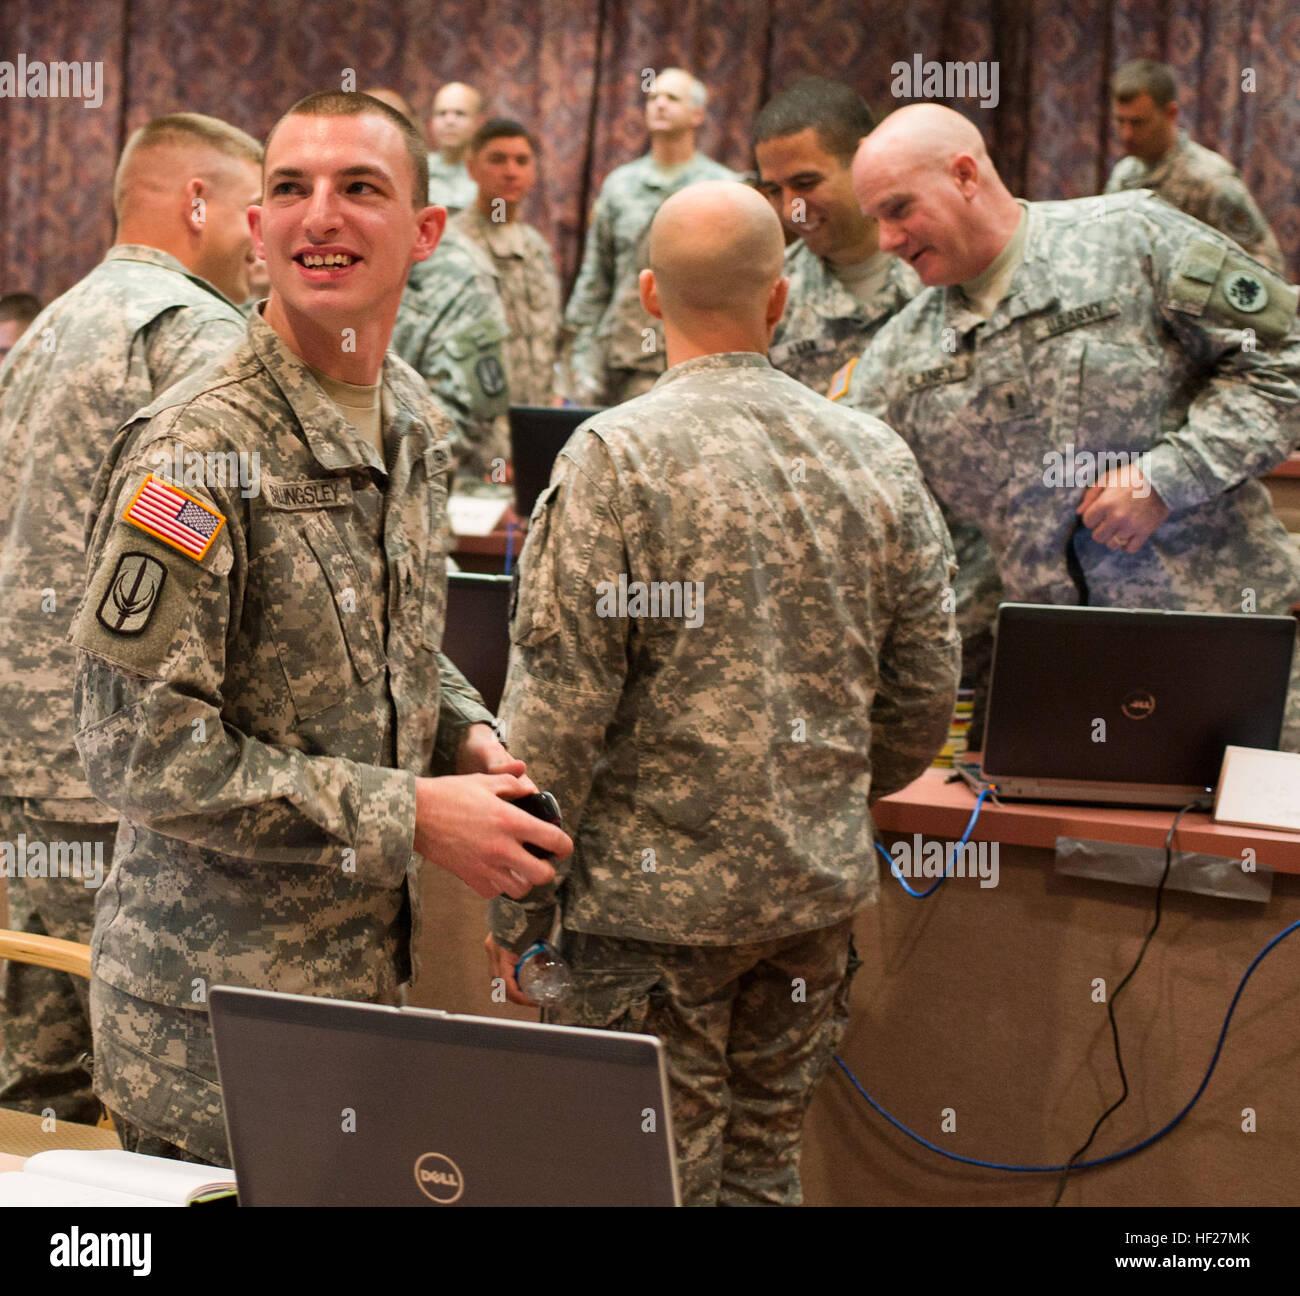 South Carolina National Guardsman Staff Sgt. James Billingsly confirms Team National Guard's win during the U.S. Stock Photo